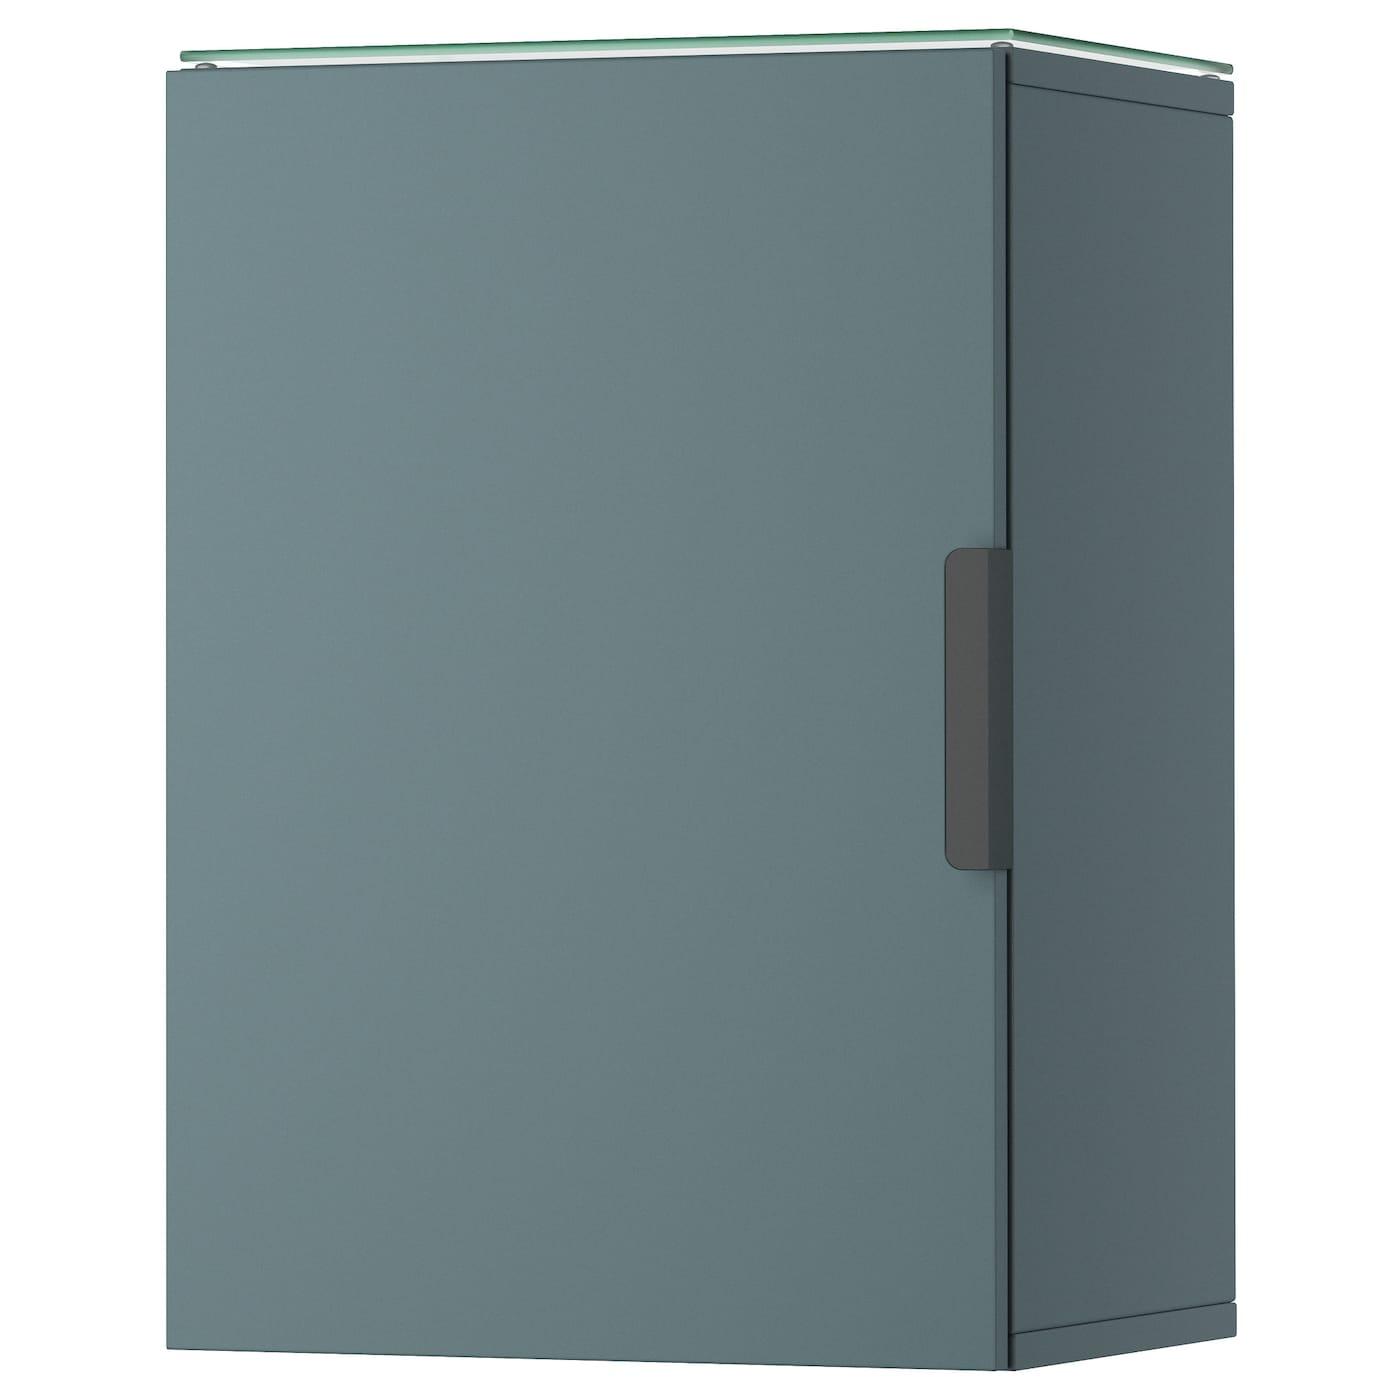 Godmorgon wall cabinet with 1 door grey turquoise 40x32x58 cm ikea - Mobiletti da bagno ikea ...